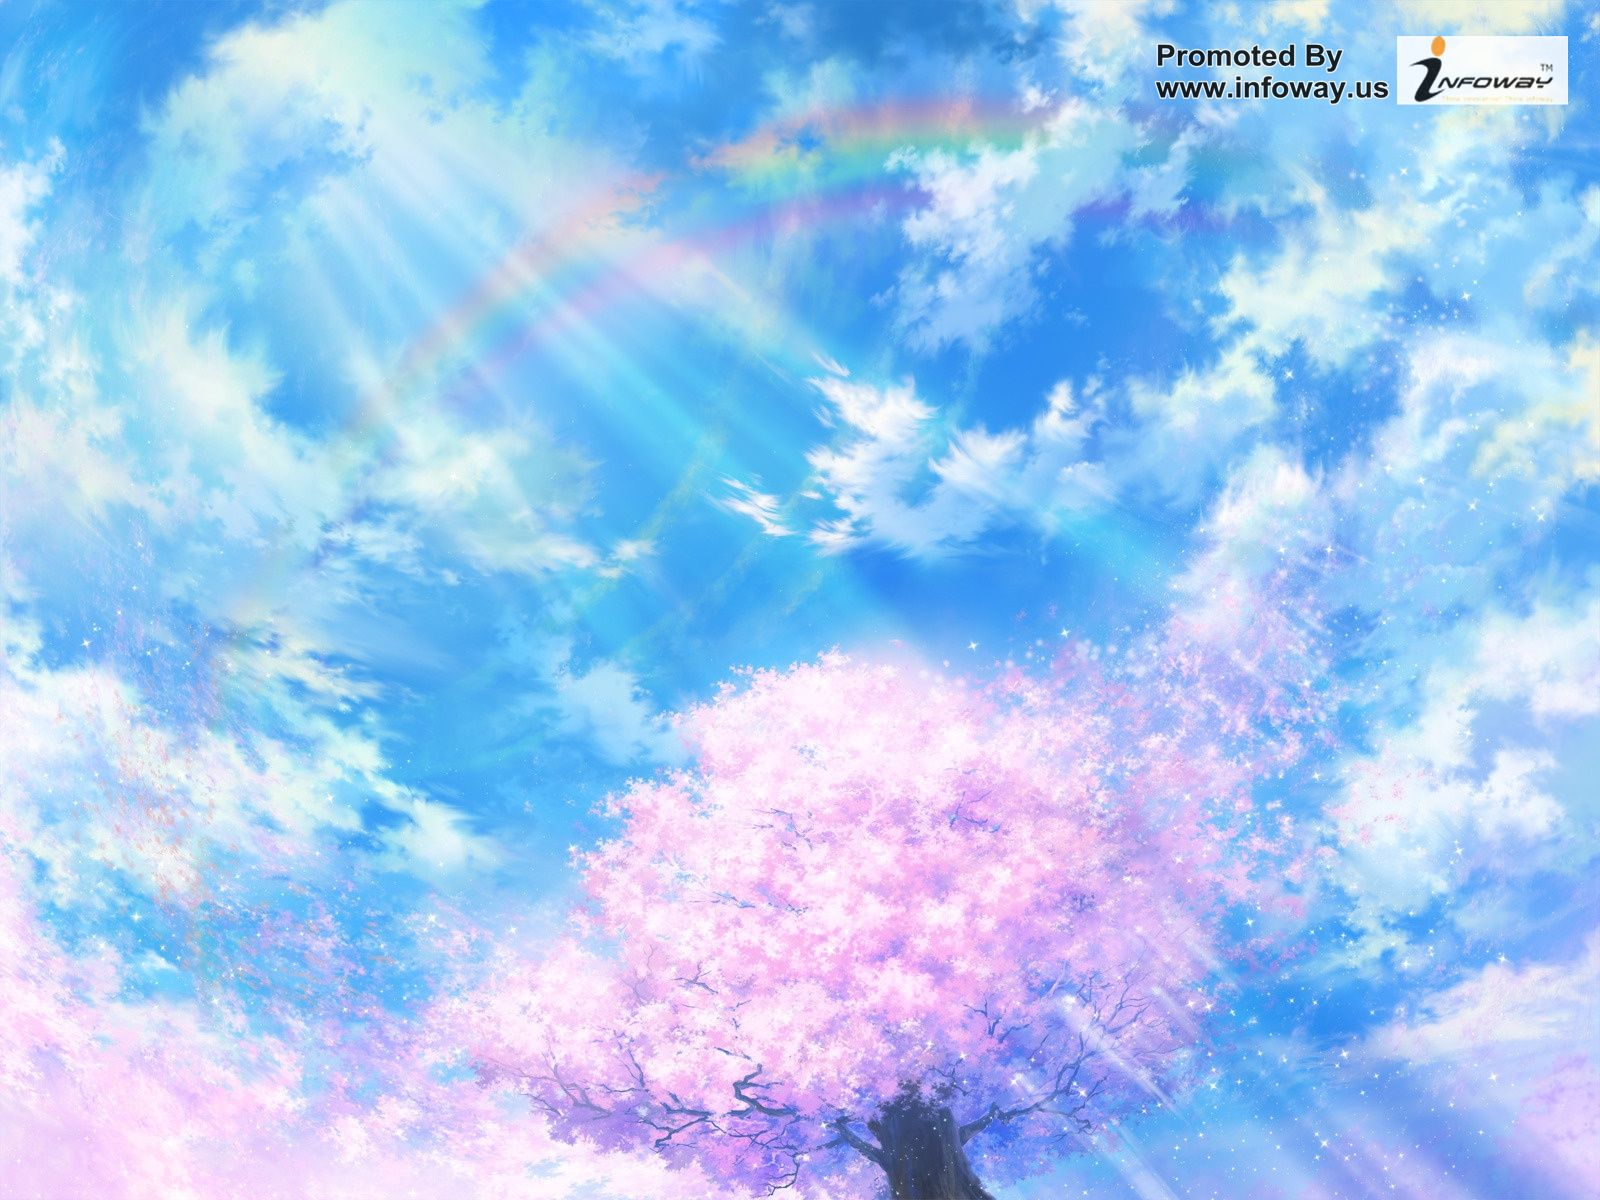 painting wallpaper sakura tree flower spring paint clouds sky 1600x1200